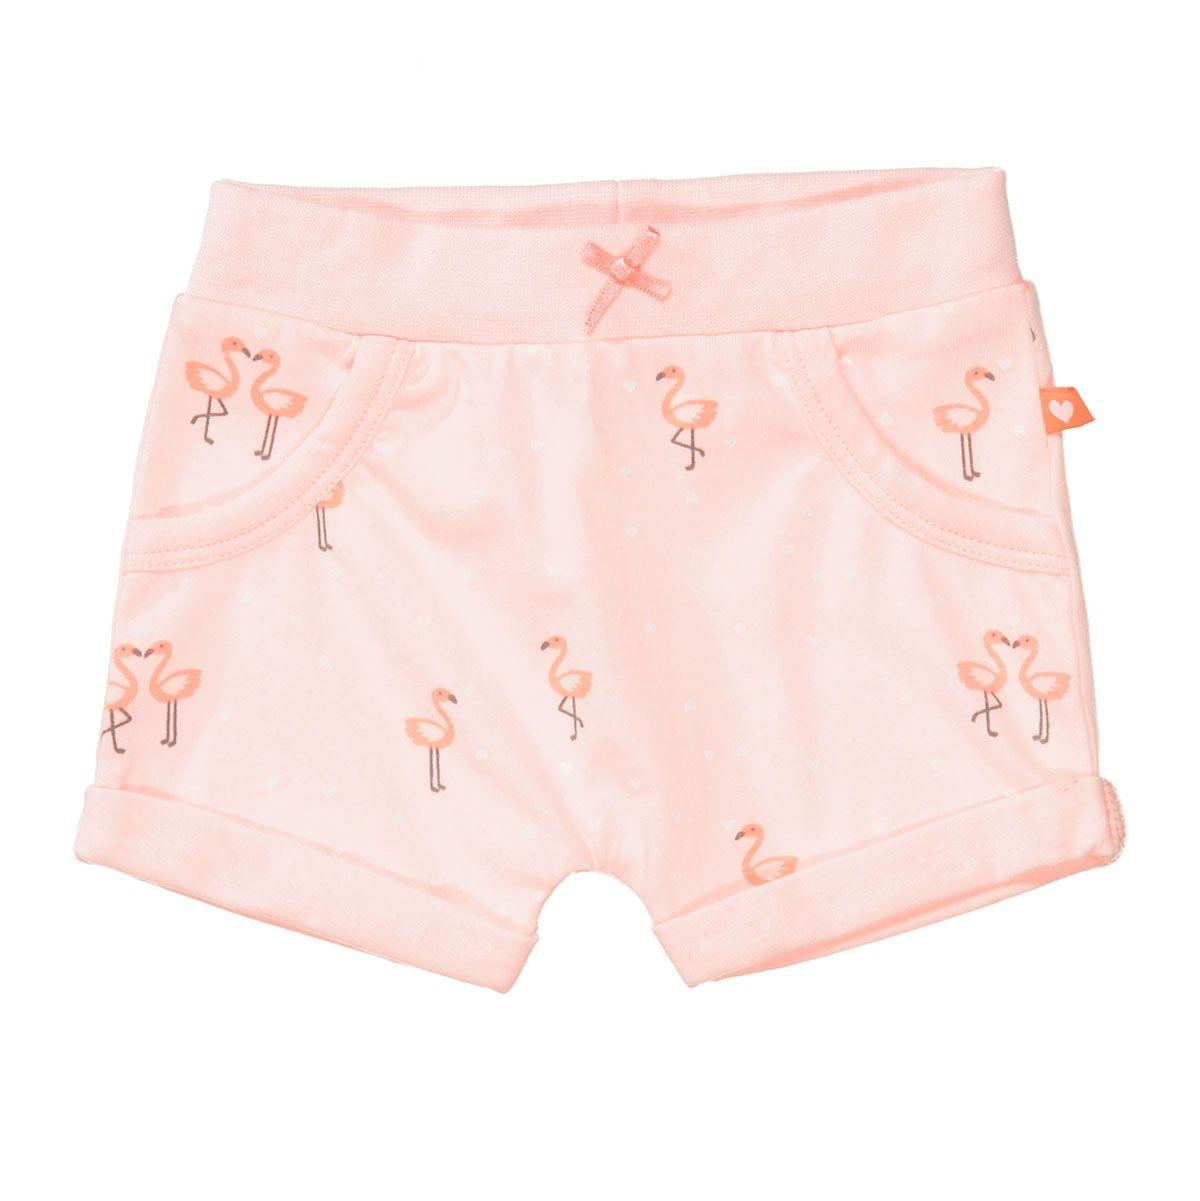 ORGANIC COTTON Shorts FLAMINGO - Soft Peach